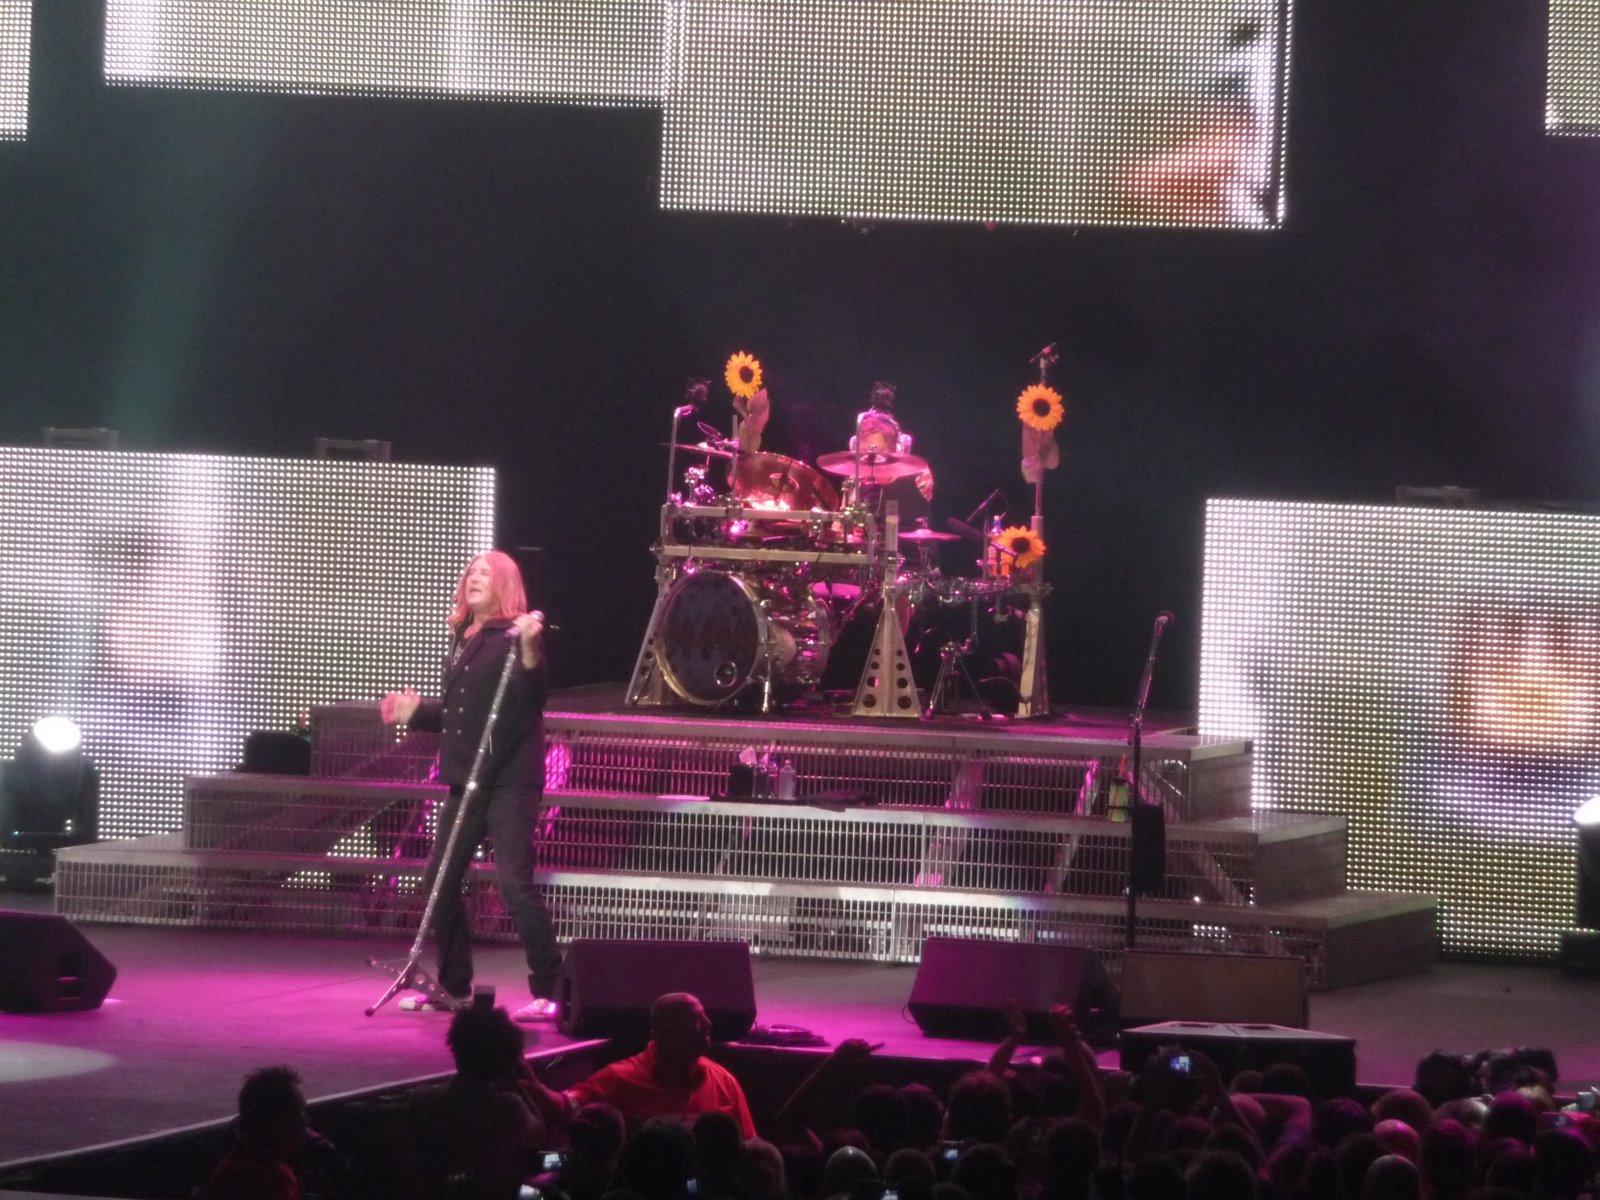 Sean andi 39 s concert photos def leppard rod laver for Door 9 rod laver arena